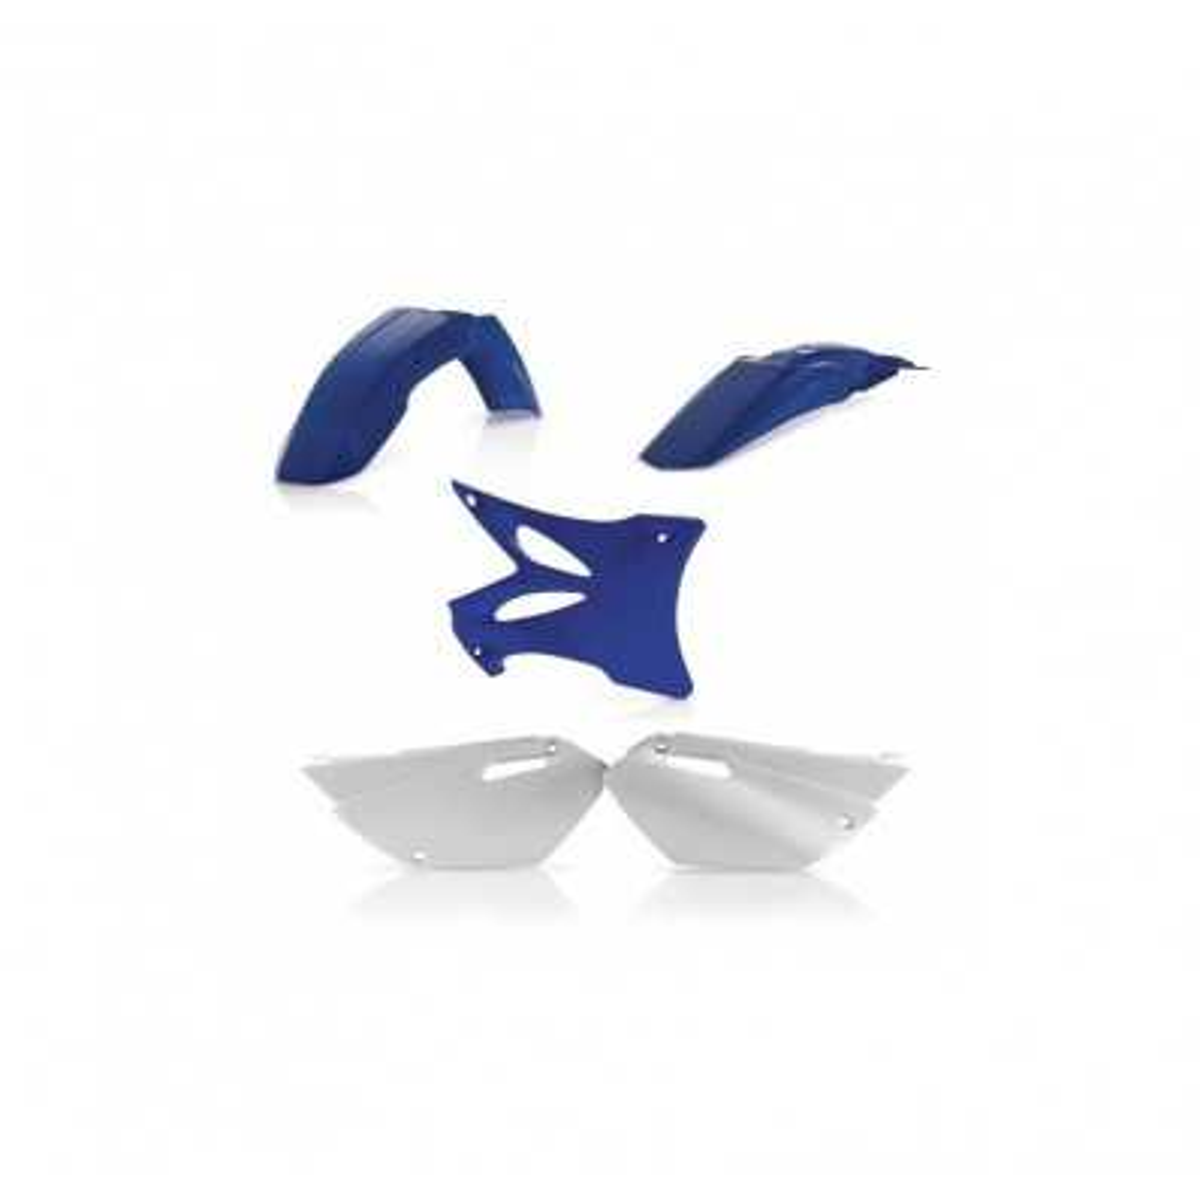 0023080-040 - Kit Plasticos Yzf 250 18 Azul